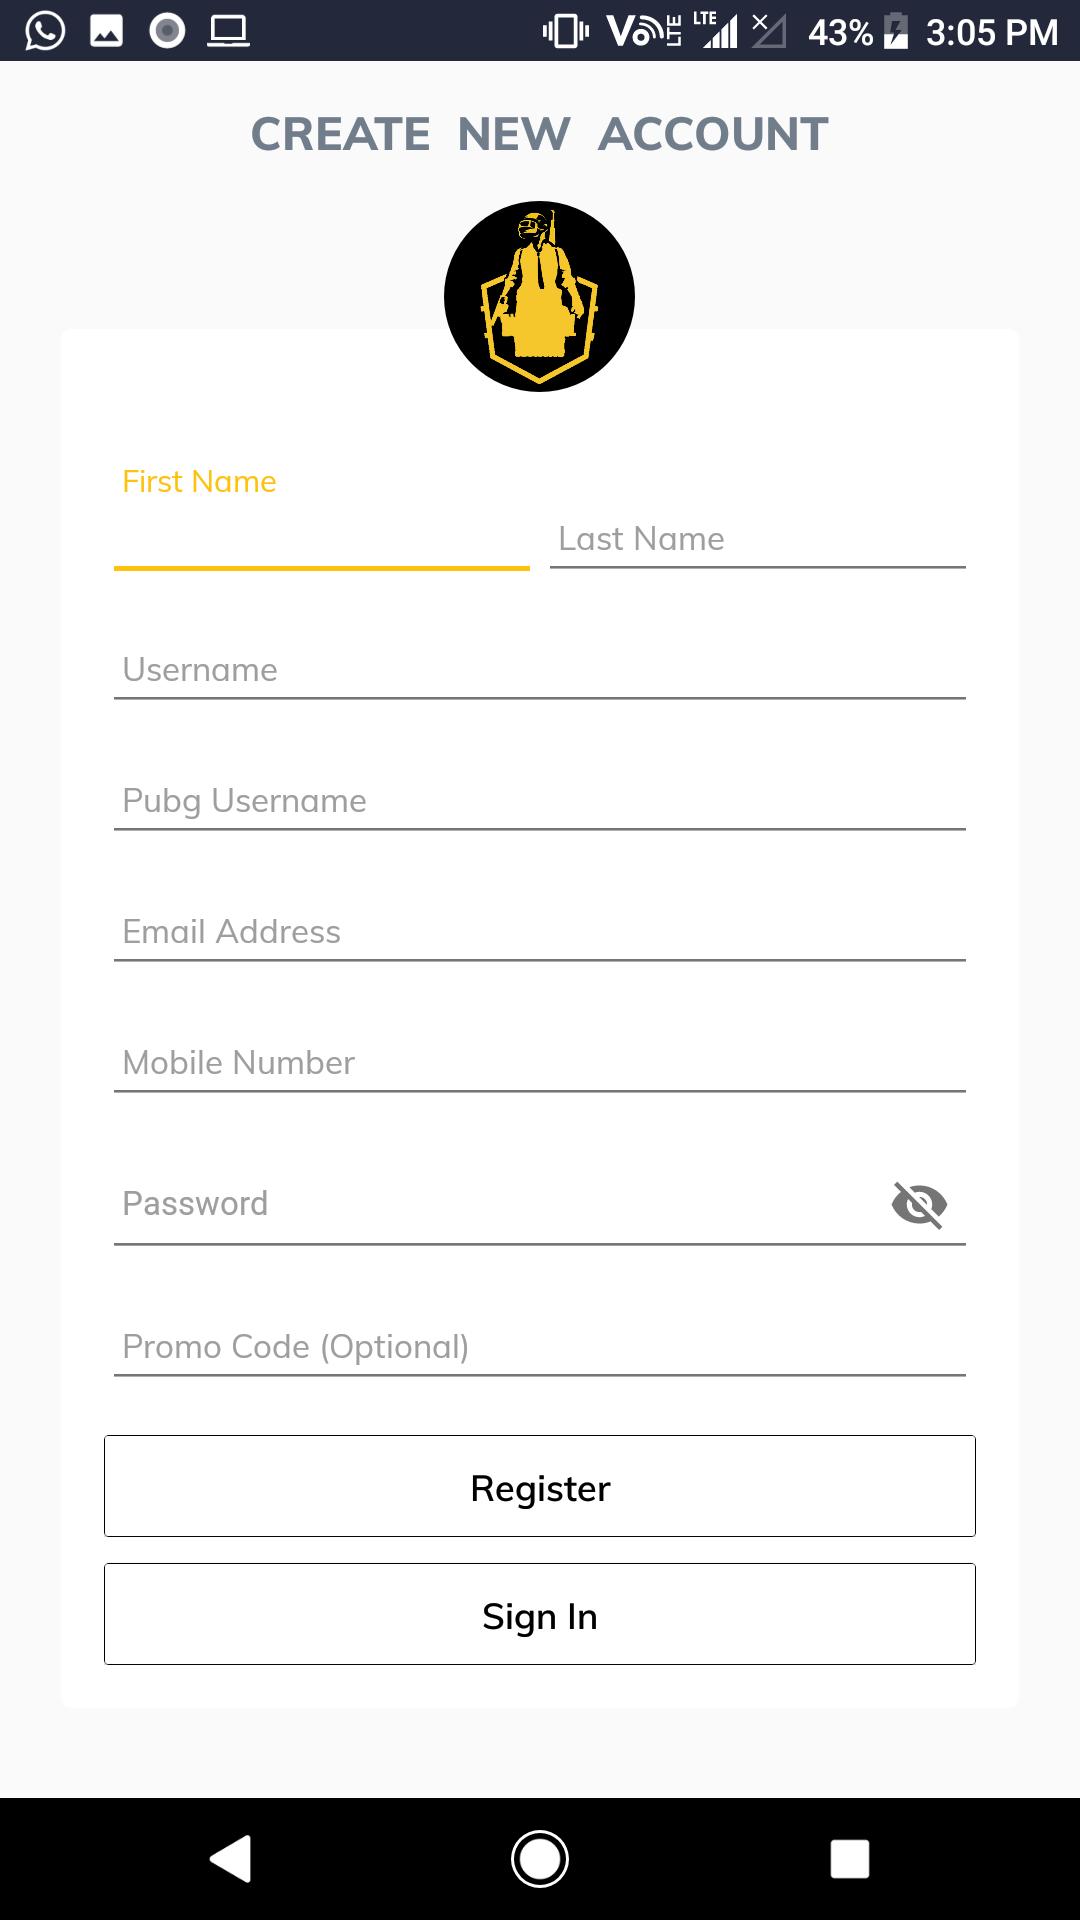 PUBG Tournament App with Admin Panel - BattleWorld